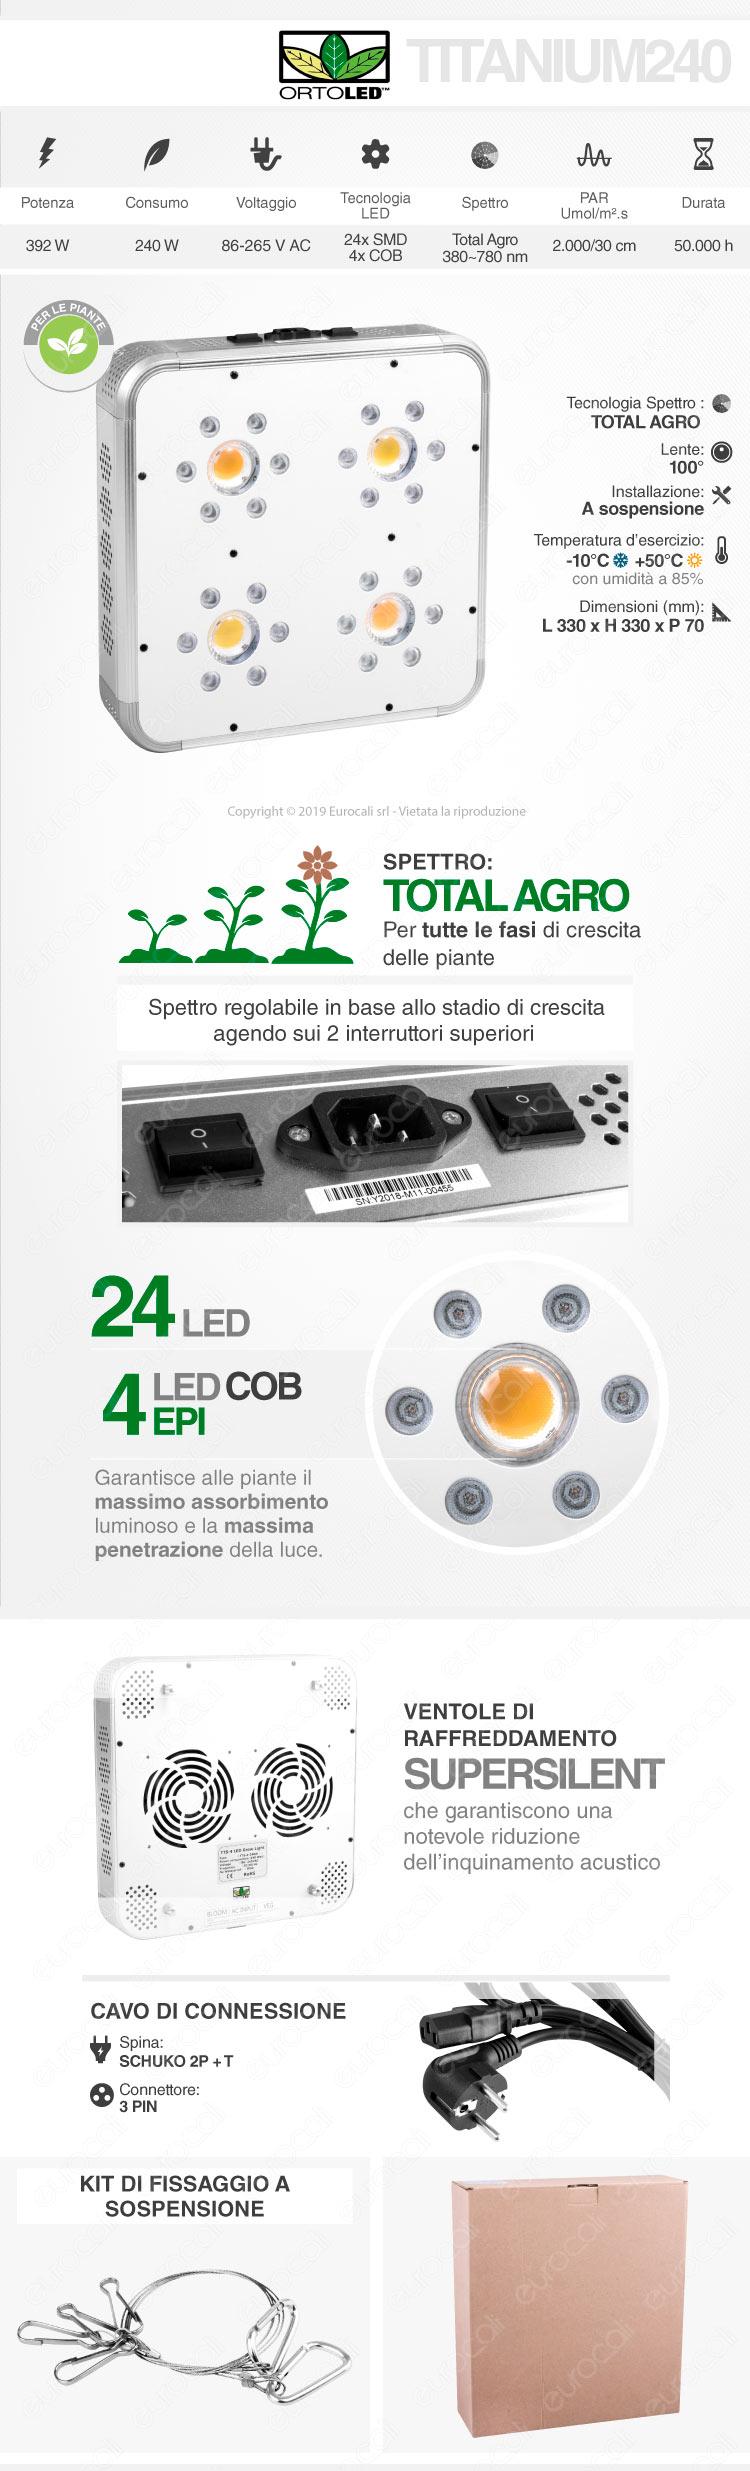 Ortoled Titanium Total Agro Lampada LED 392W per Coltivazione Indoor Consumo Reale 240W